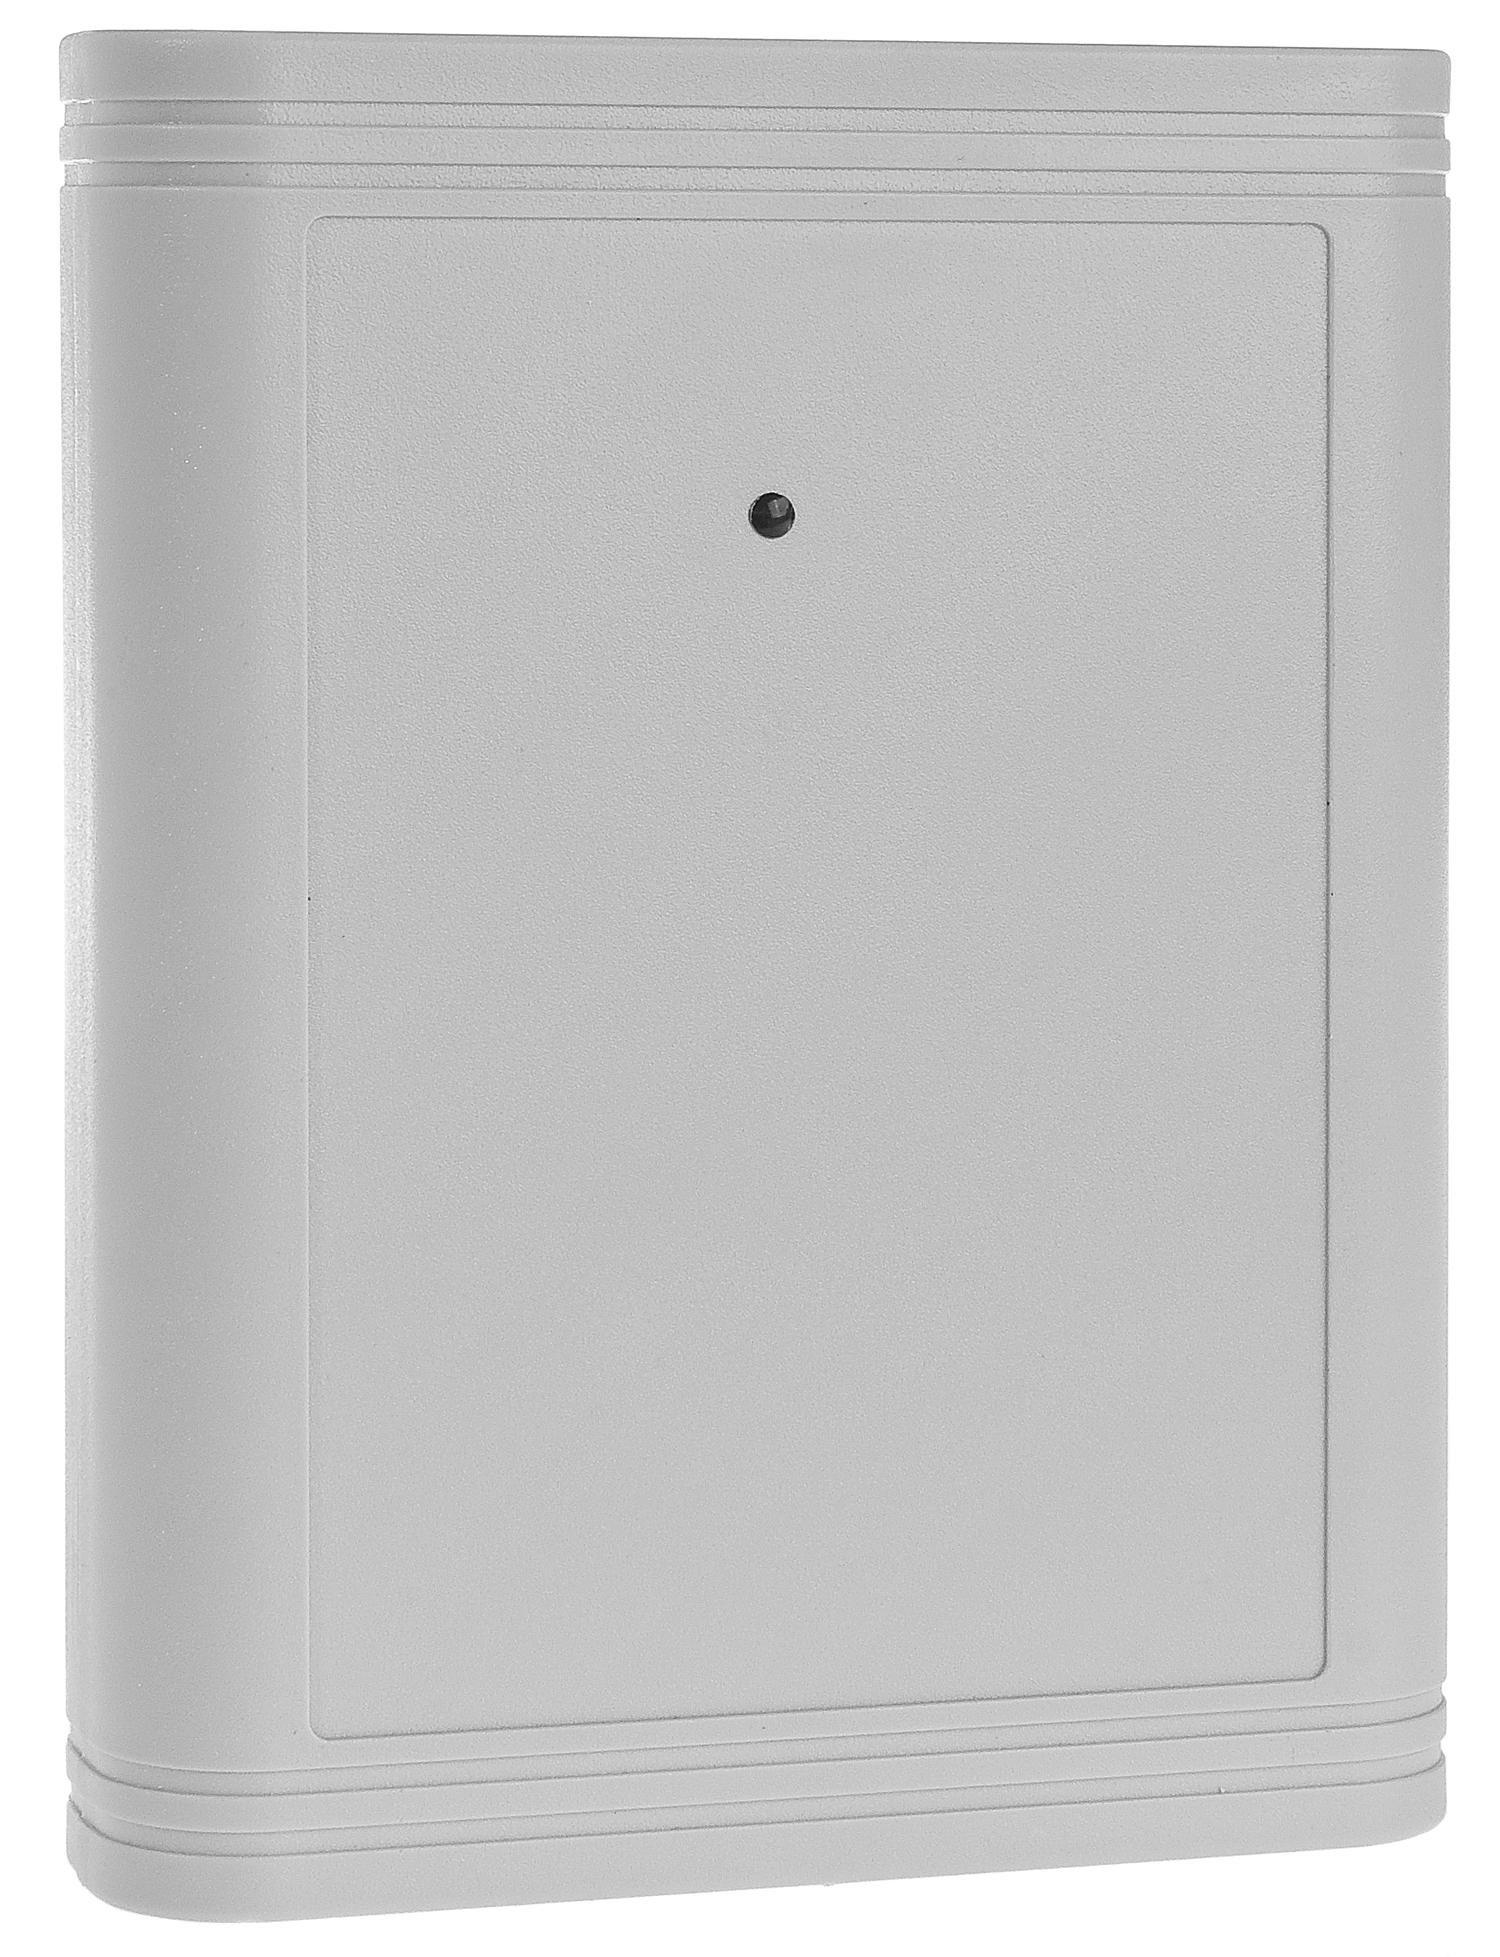 Moduł Ropam GSM BasicGSM-BOX 2